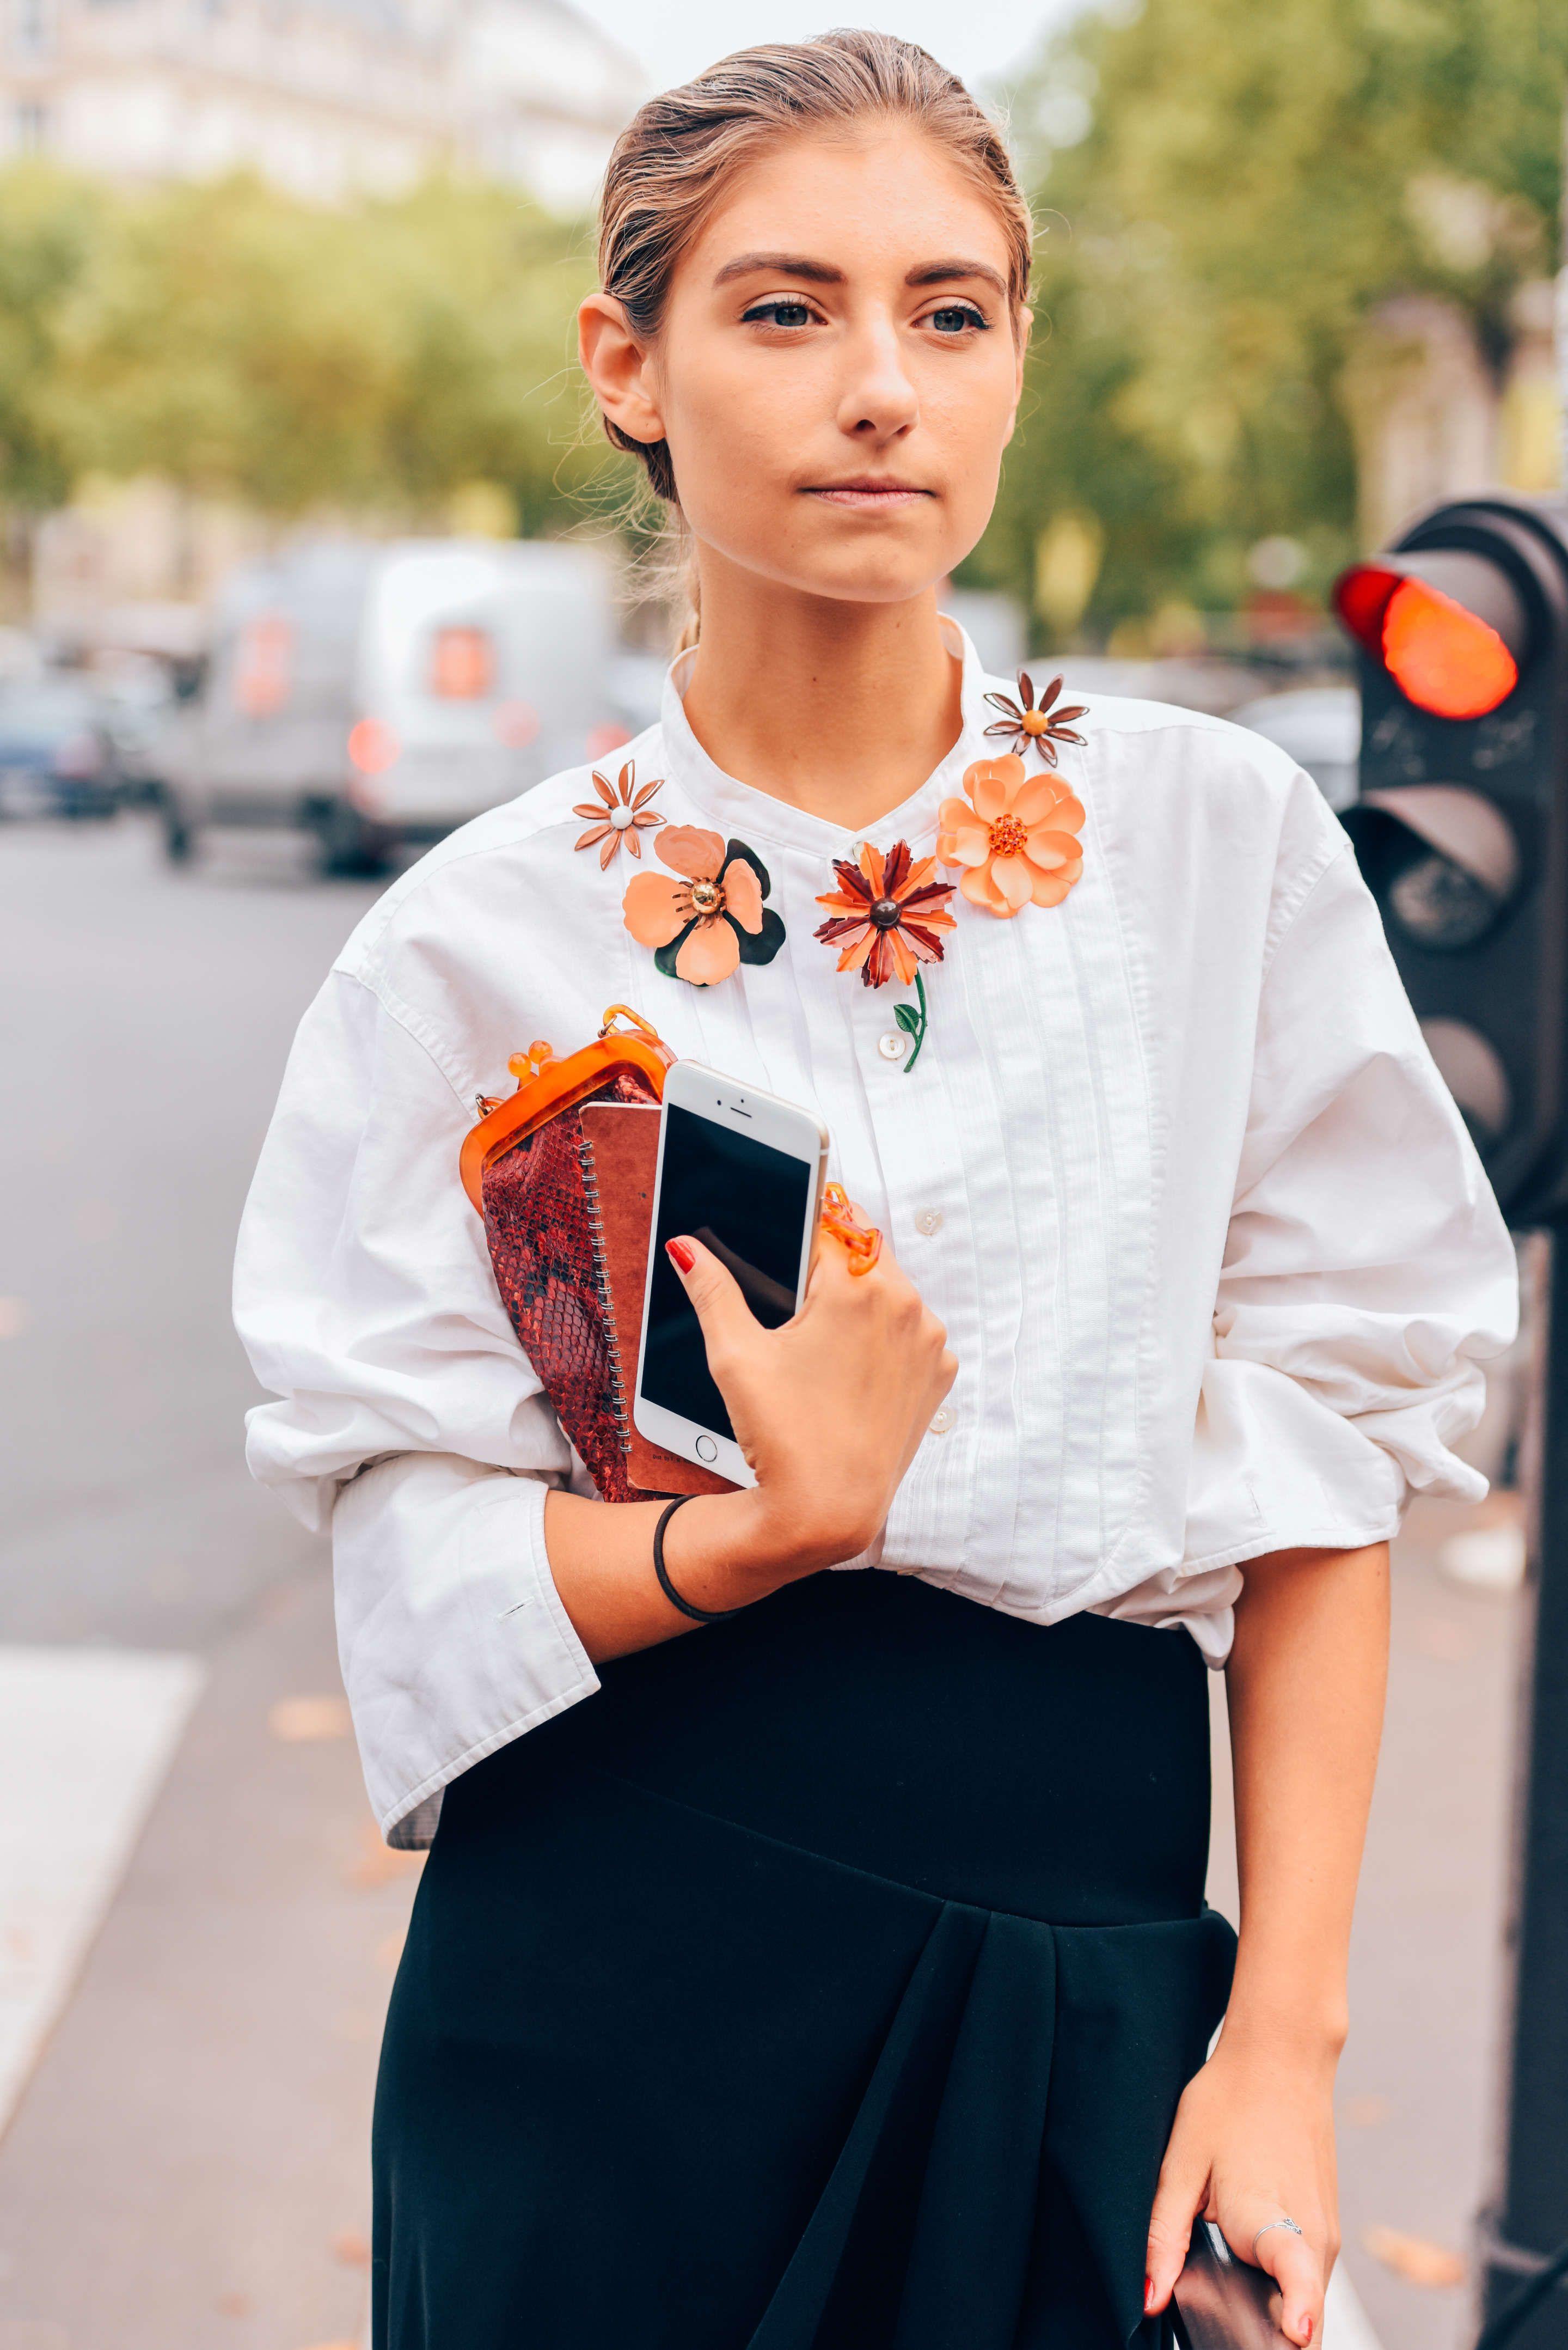 October 7, 2015 Tags Orange, Black, Red, White, Paris, Balenciaga, Women, Florals, Clutches, Skirts, Blouses, Snakeskin, Jenny Walton, SS16 Women's, 1 Person, Flowers